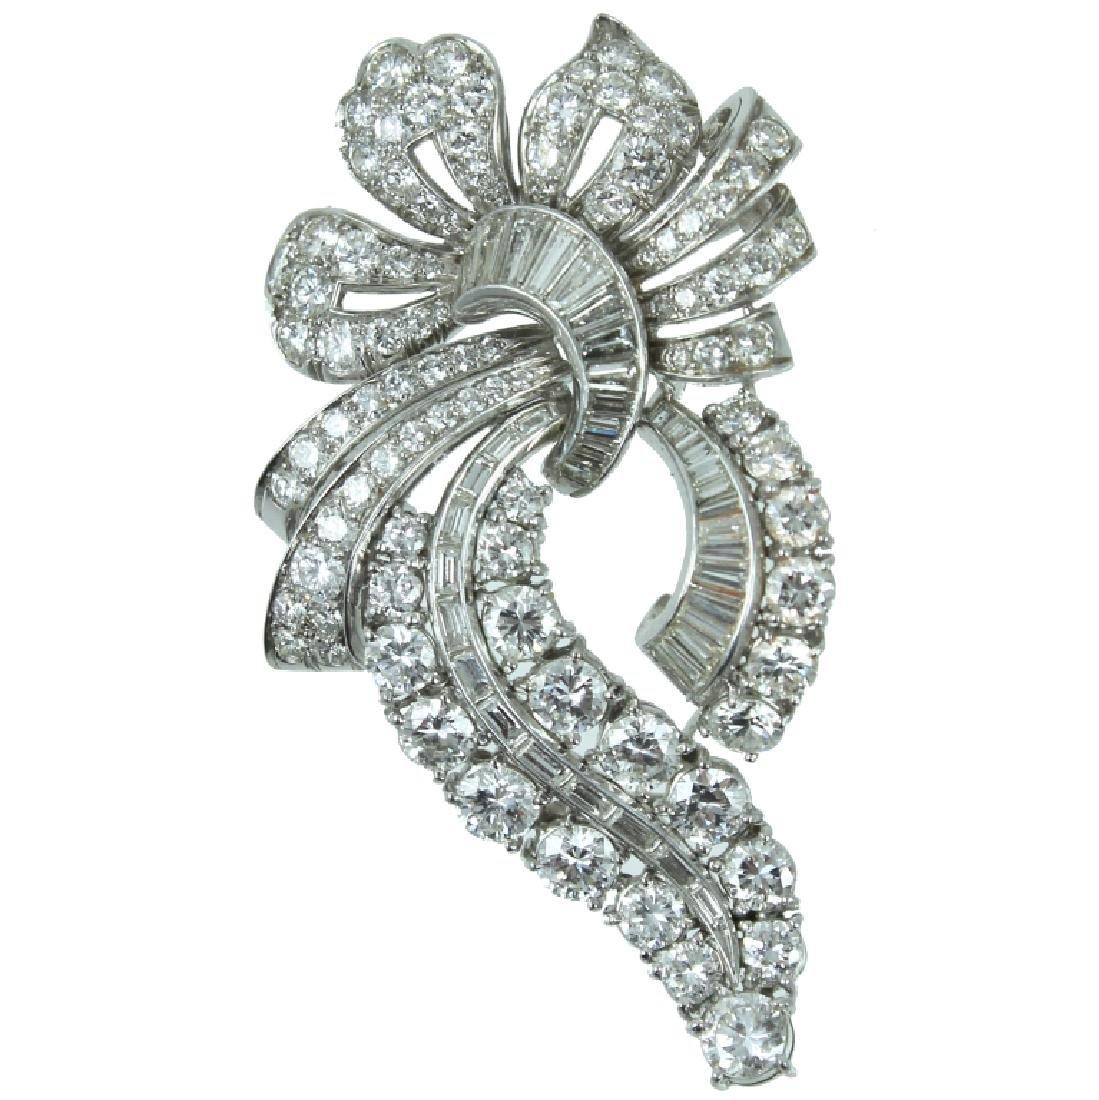 Platinum approx 11.00 carat Diamond Brooch.